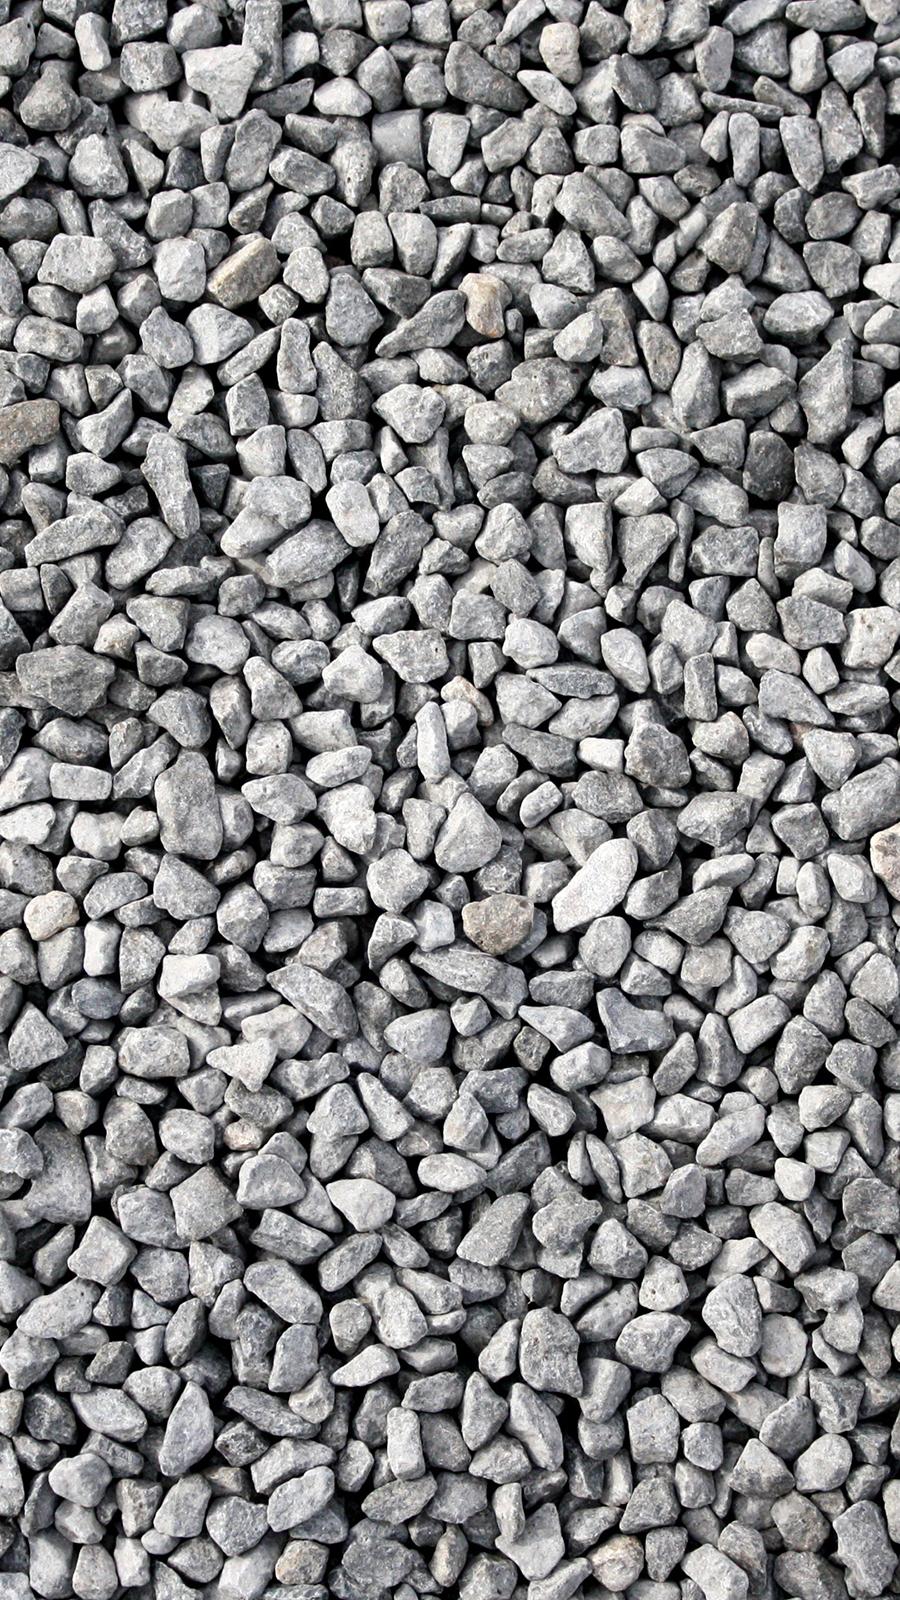 Gravel Rocks Texture Android Wallpaper